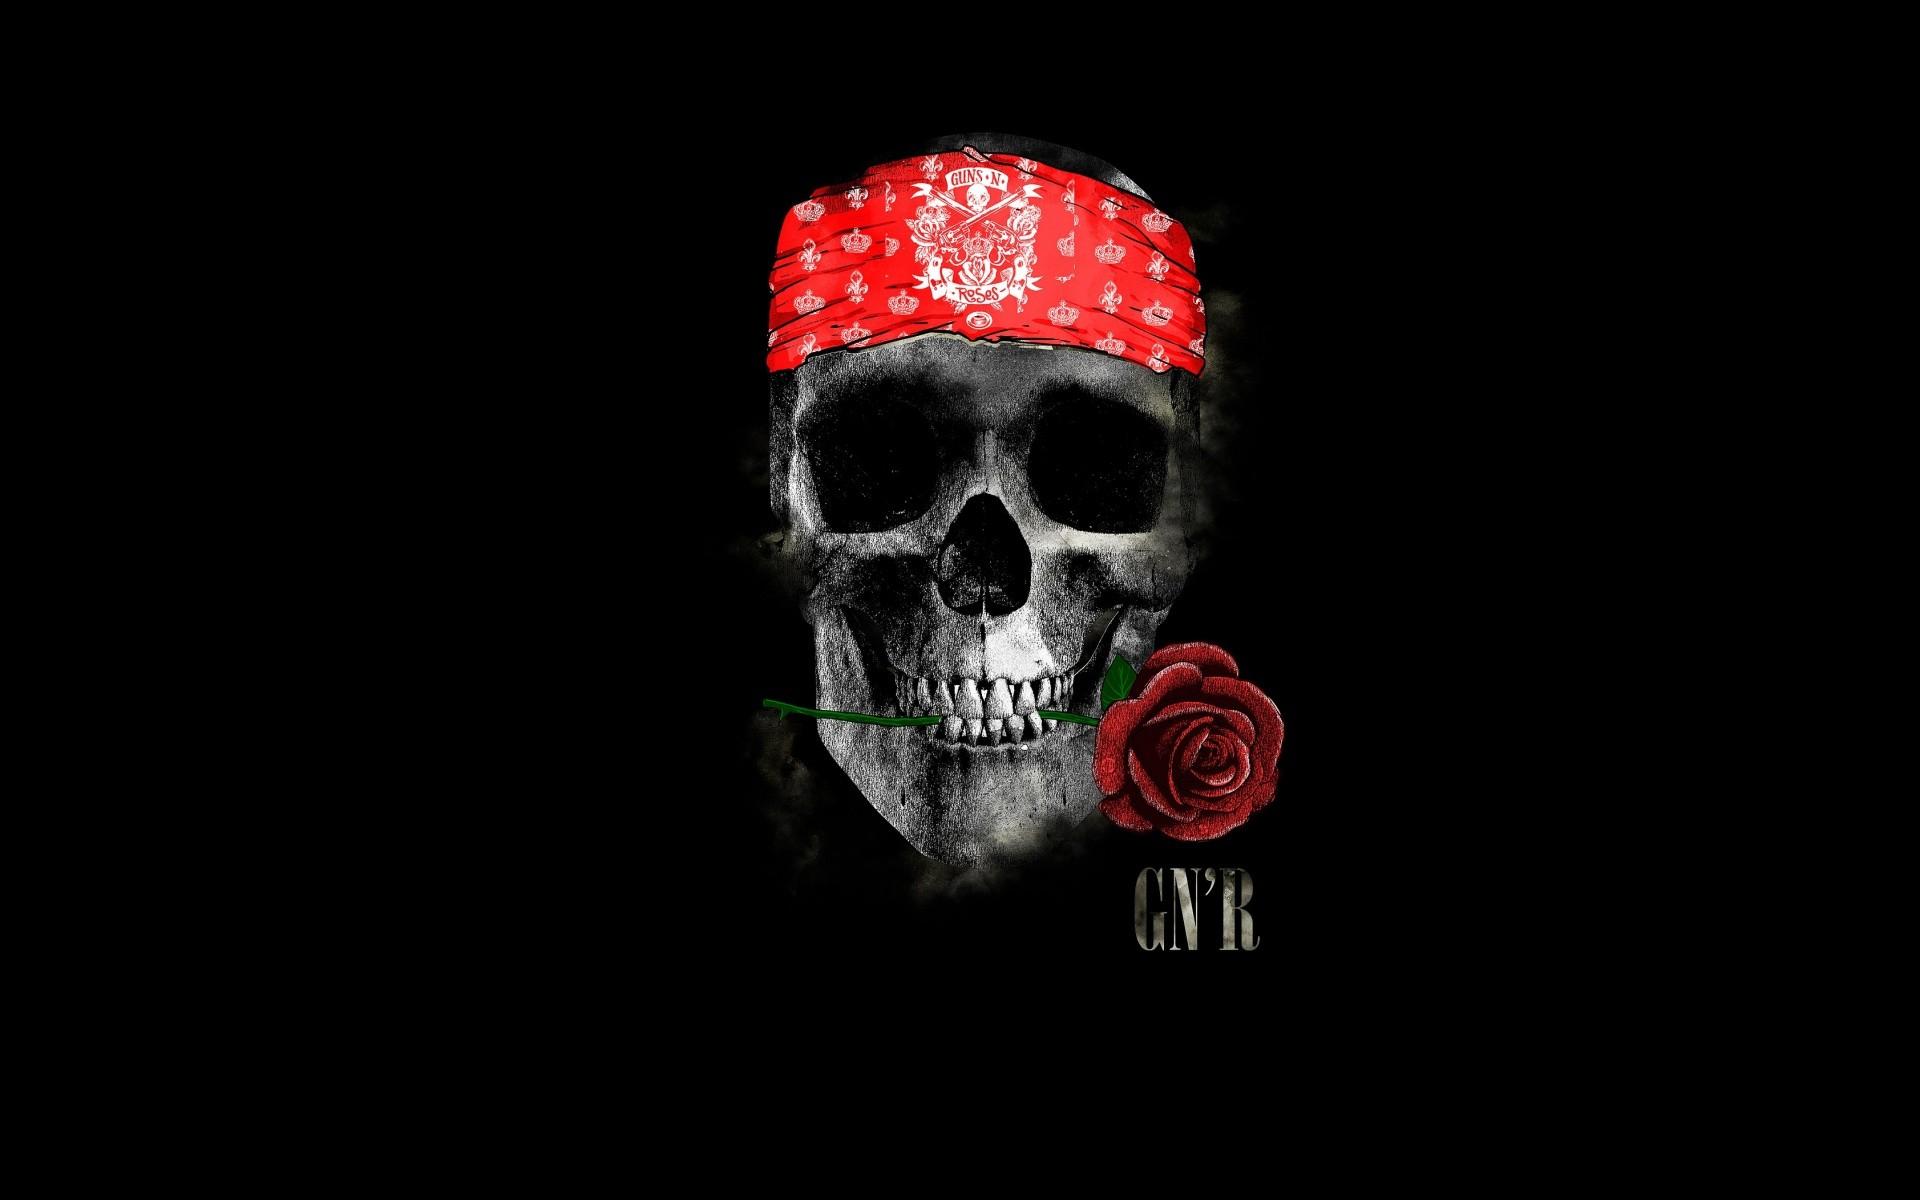 General 1920x1200 skull rose minimalism Guns N' Roses headband rock and roll